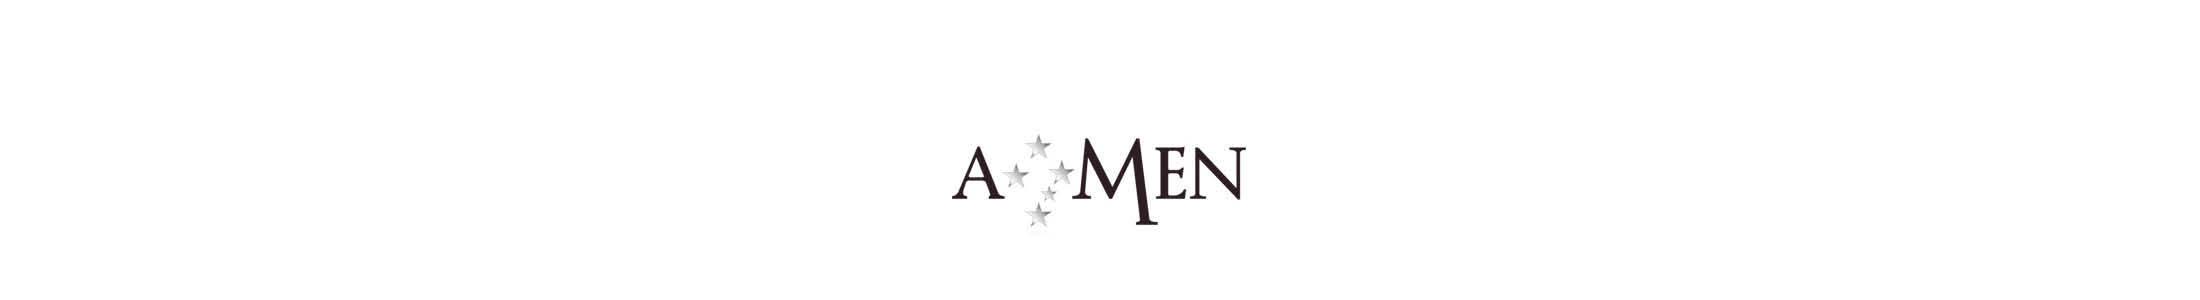 Amen Logo